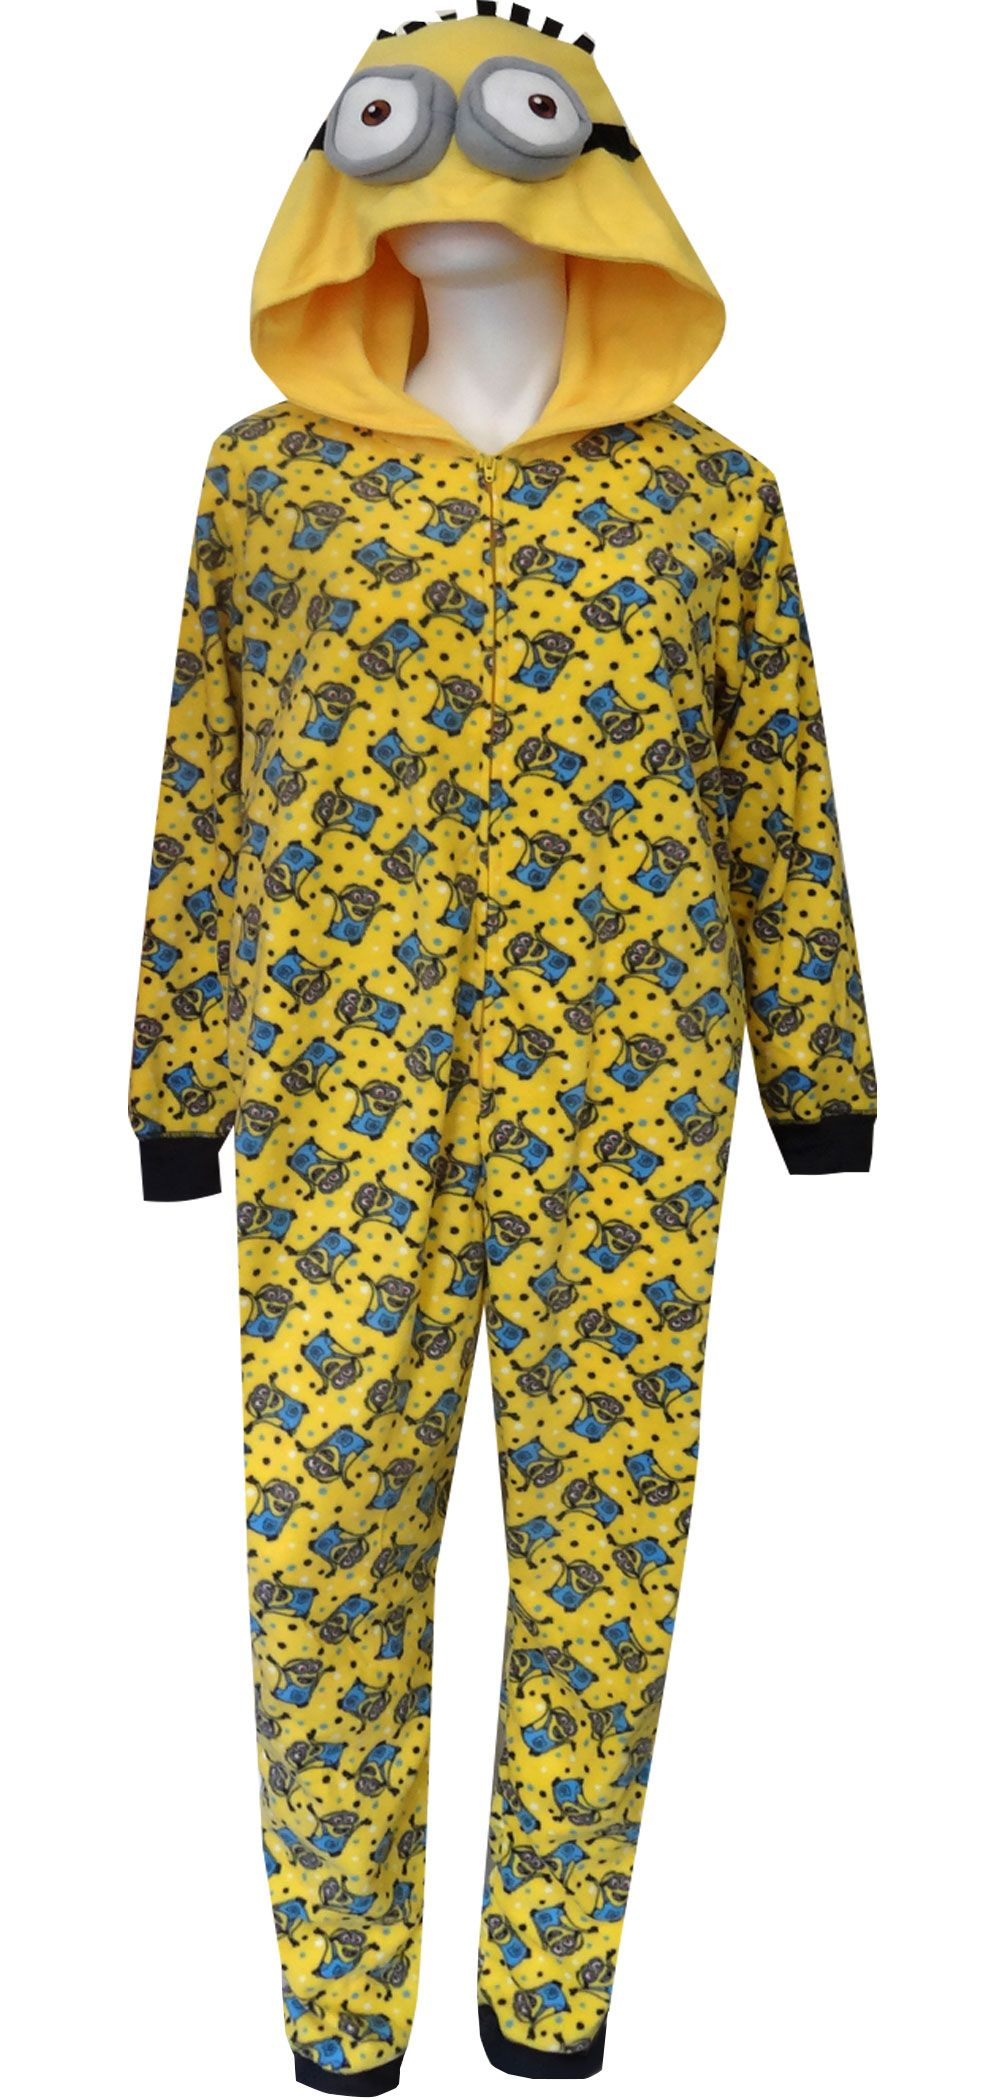 Despicable Me Minion Hooded Plus Size One Piece Pajama  2507c5e46